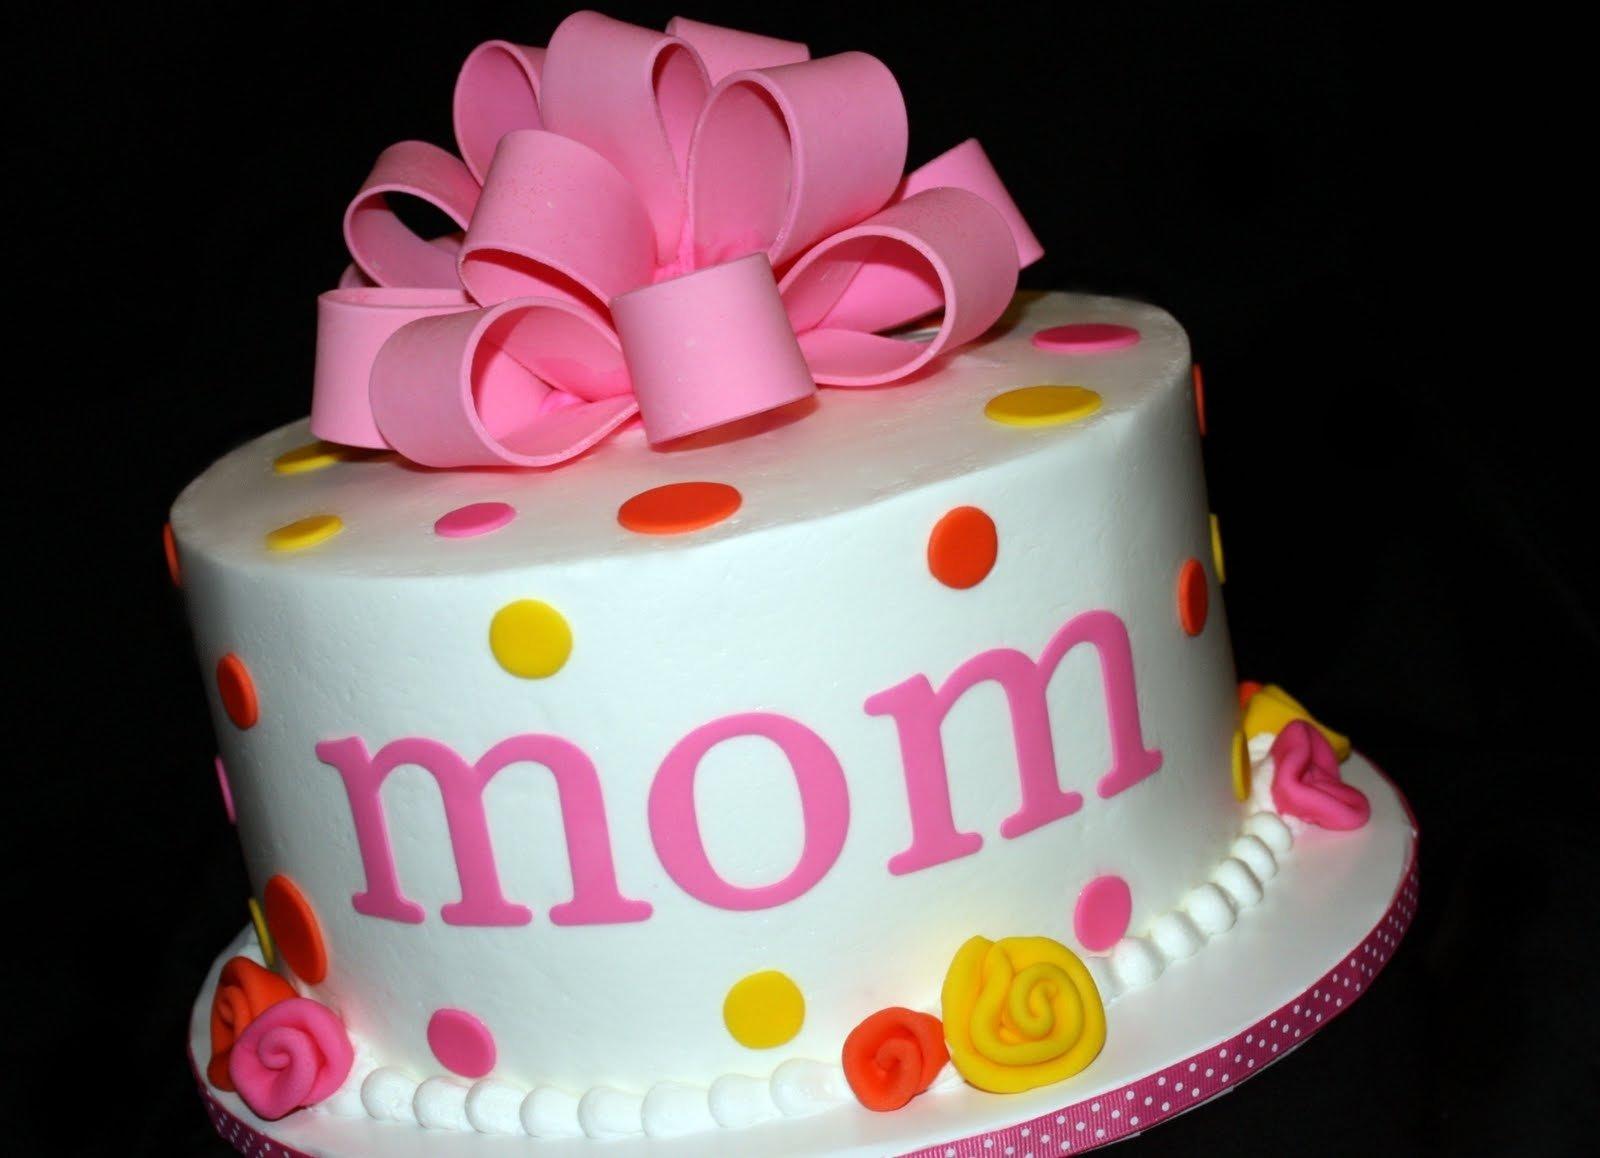 10 Fashionable Birthday Cake Ideas For Mom fun cakes mom birthday cake fun cakes pinterest mom birthday 2021